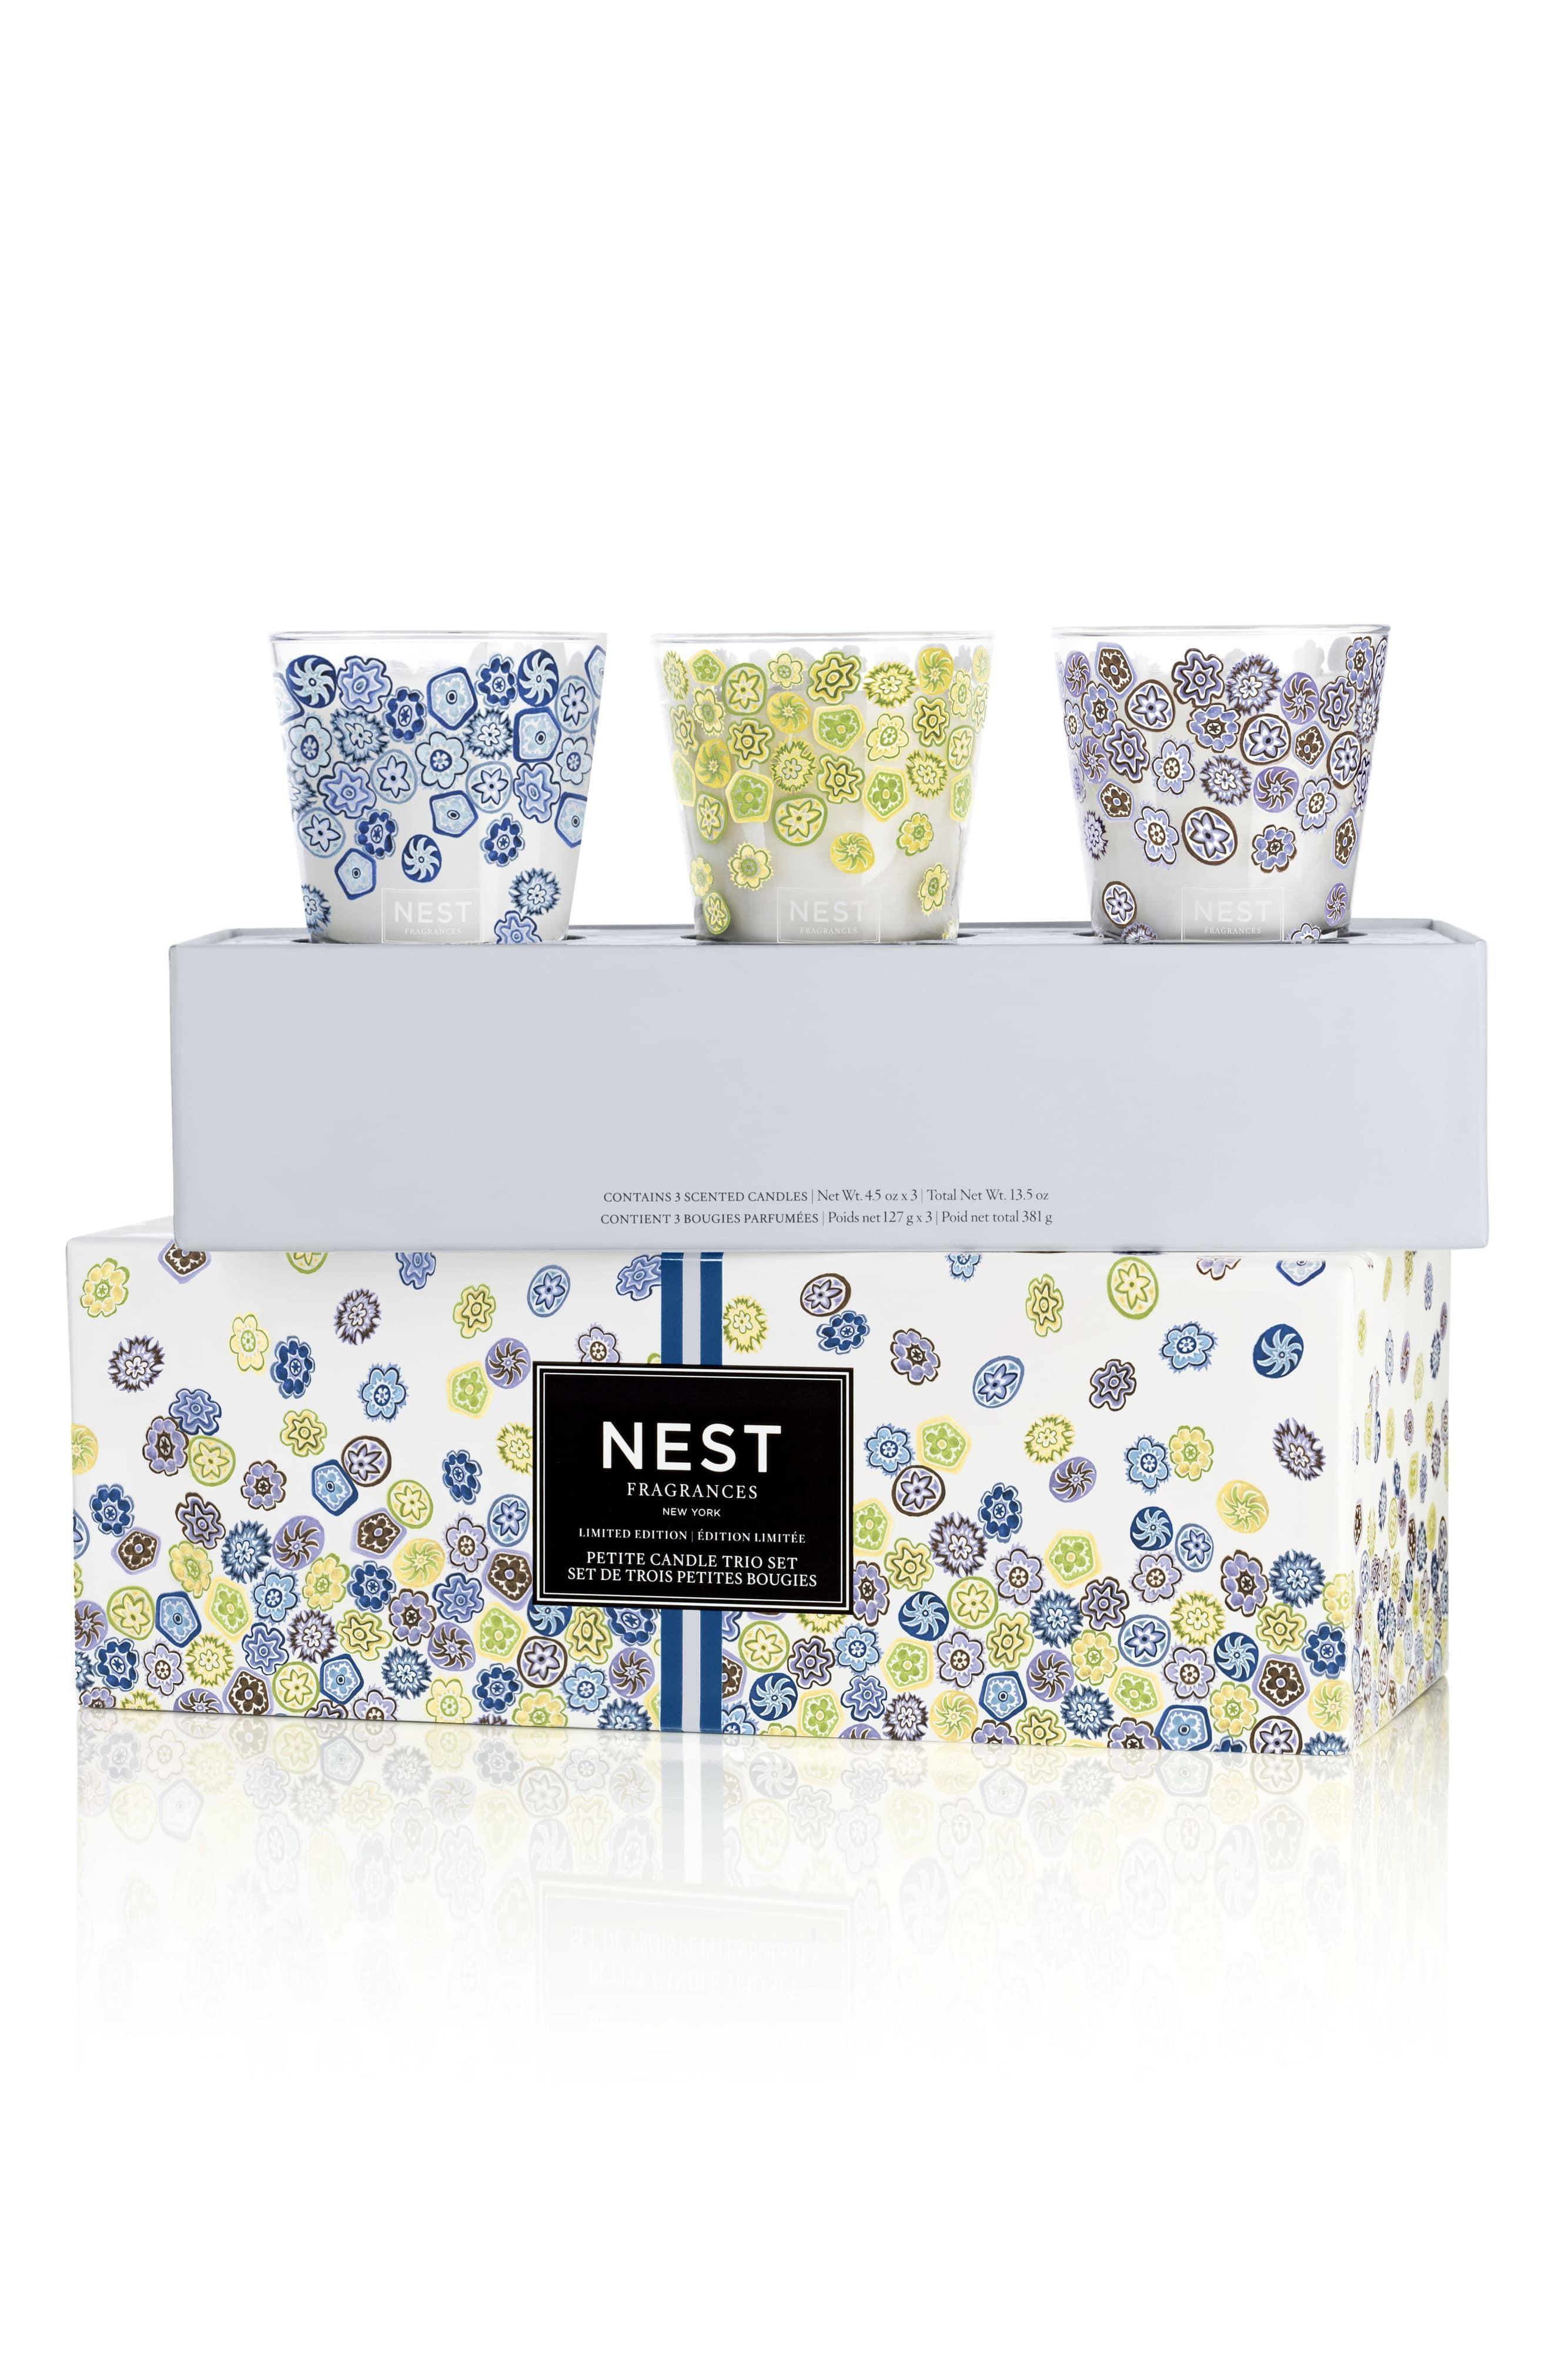 Nest Fragrances Petite Candle Trio Set Limited Edition Candles